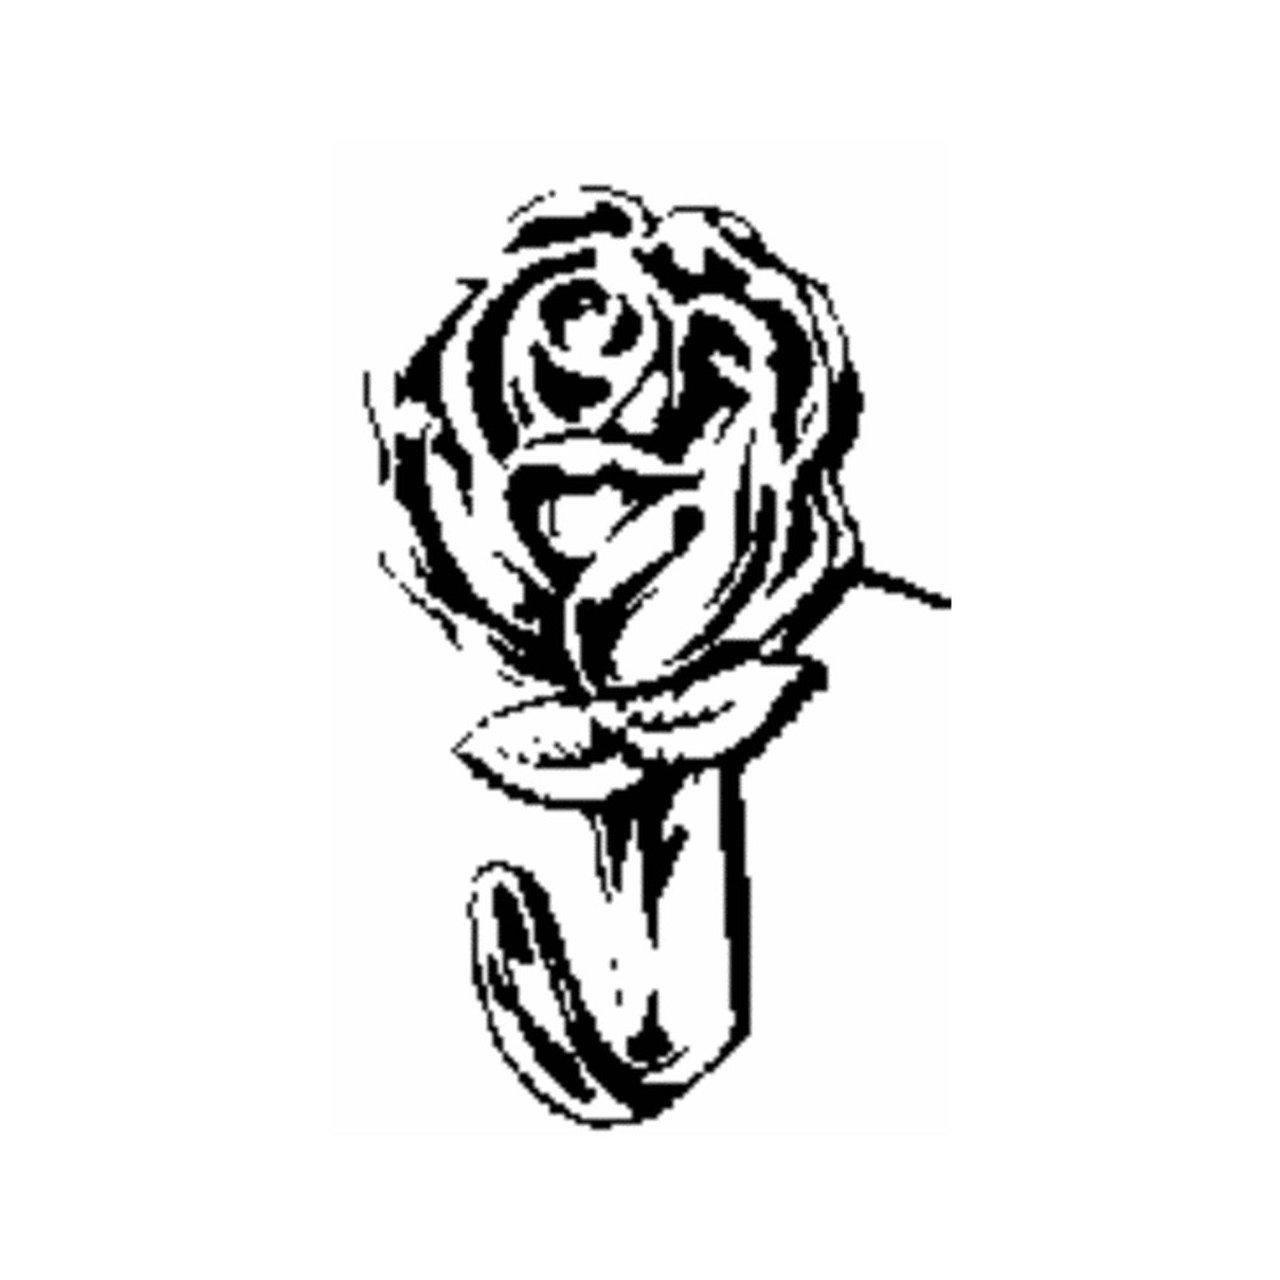 Hillman 122292 Rosa Push Push Push Pin Kleiderbügel, Messing Antik, 10 Stück B000VRSSSI | Spielen Sie Leidenschaft, spielen Sie die Ernte, spielen Sie die Welt  1022ae